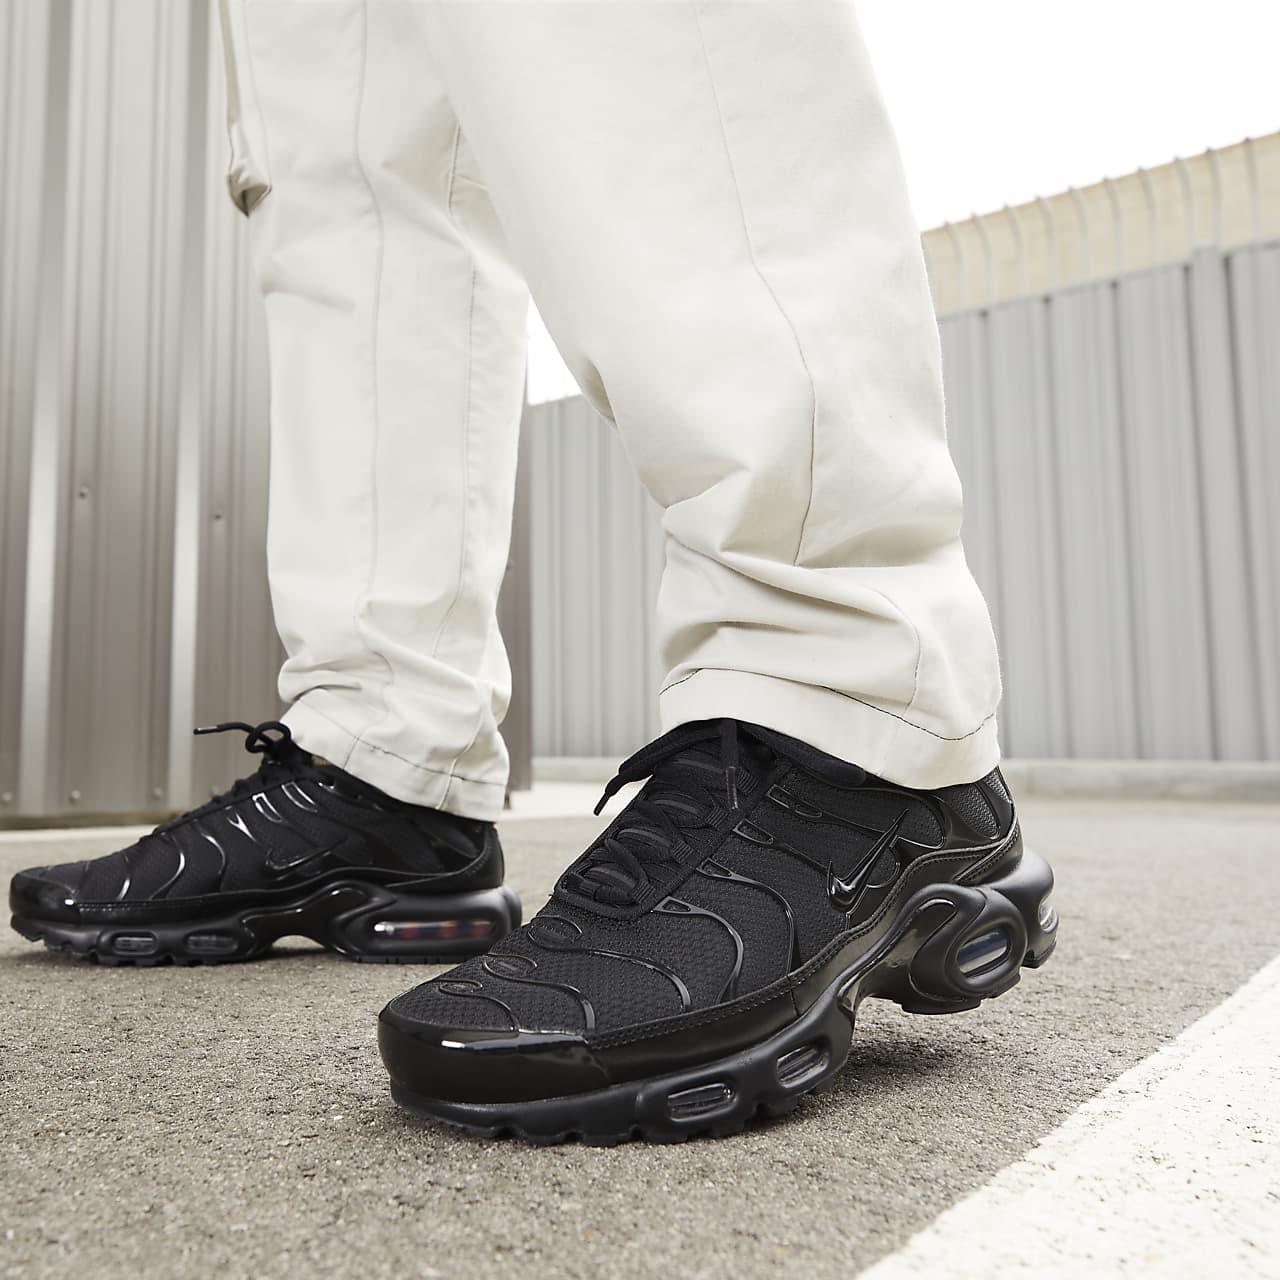 Nike Air Max Plus Men's Shoes. Nike.com